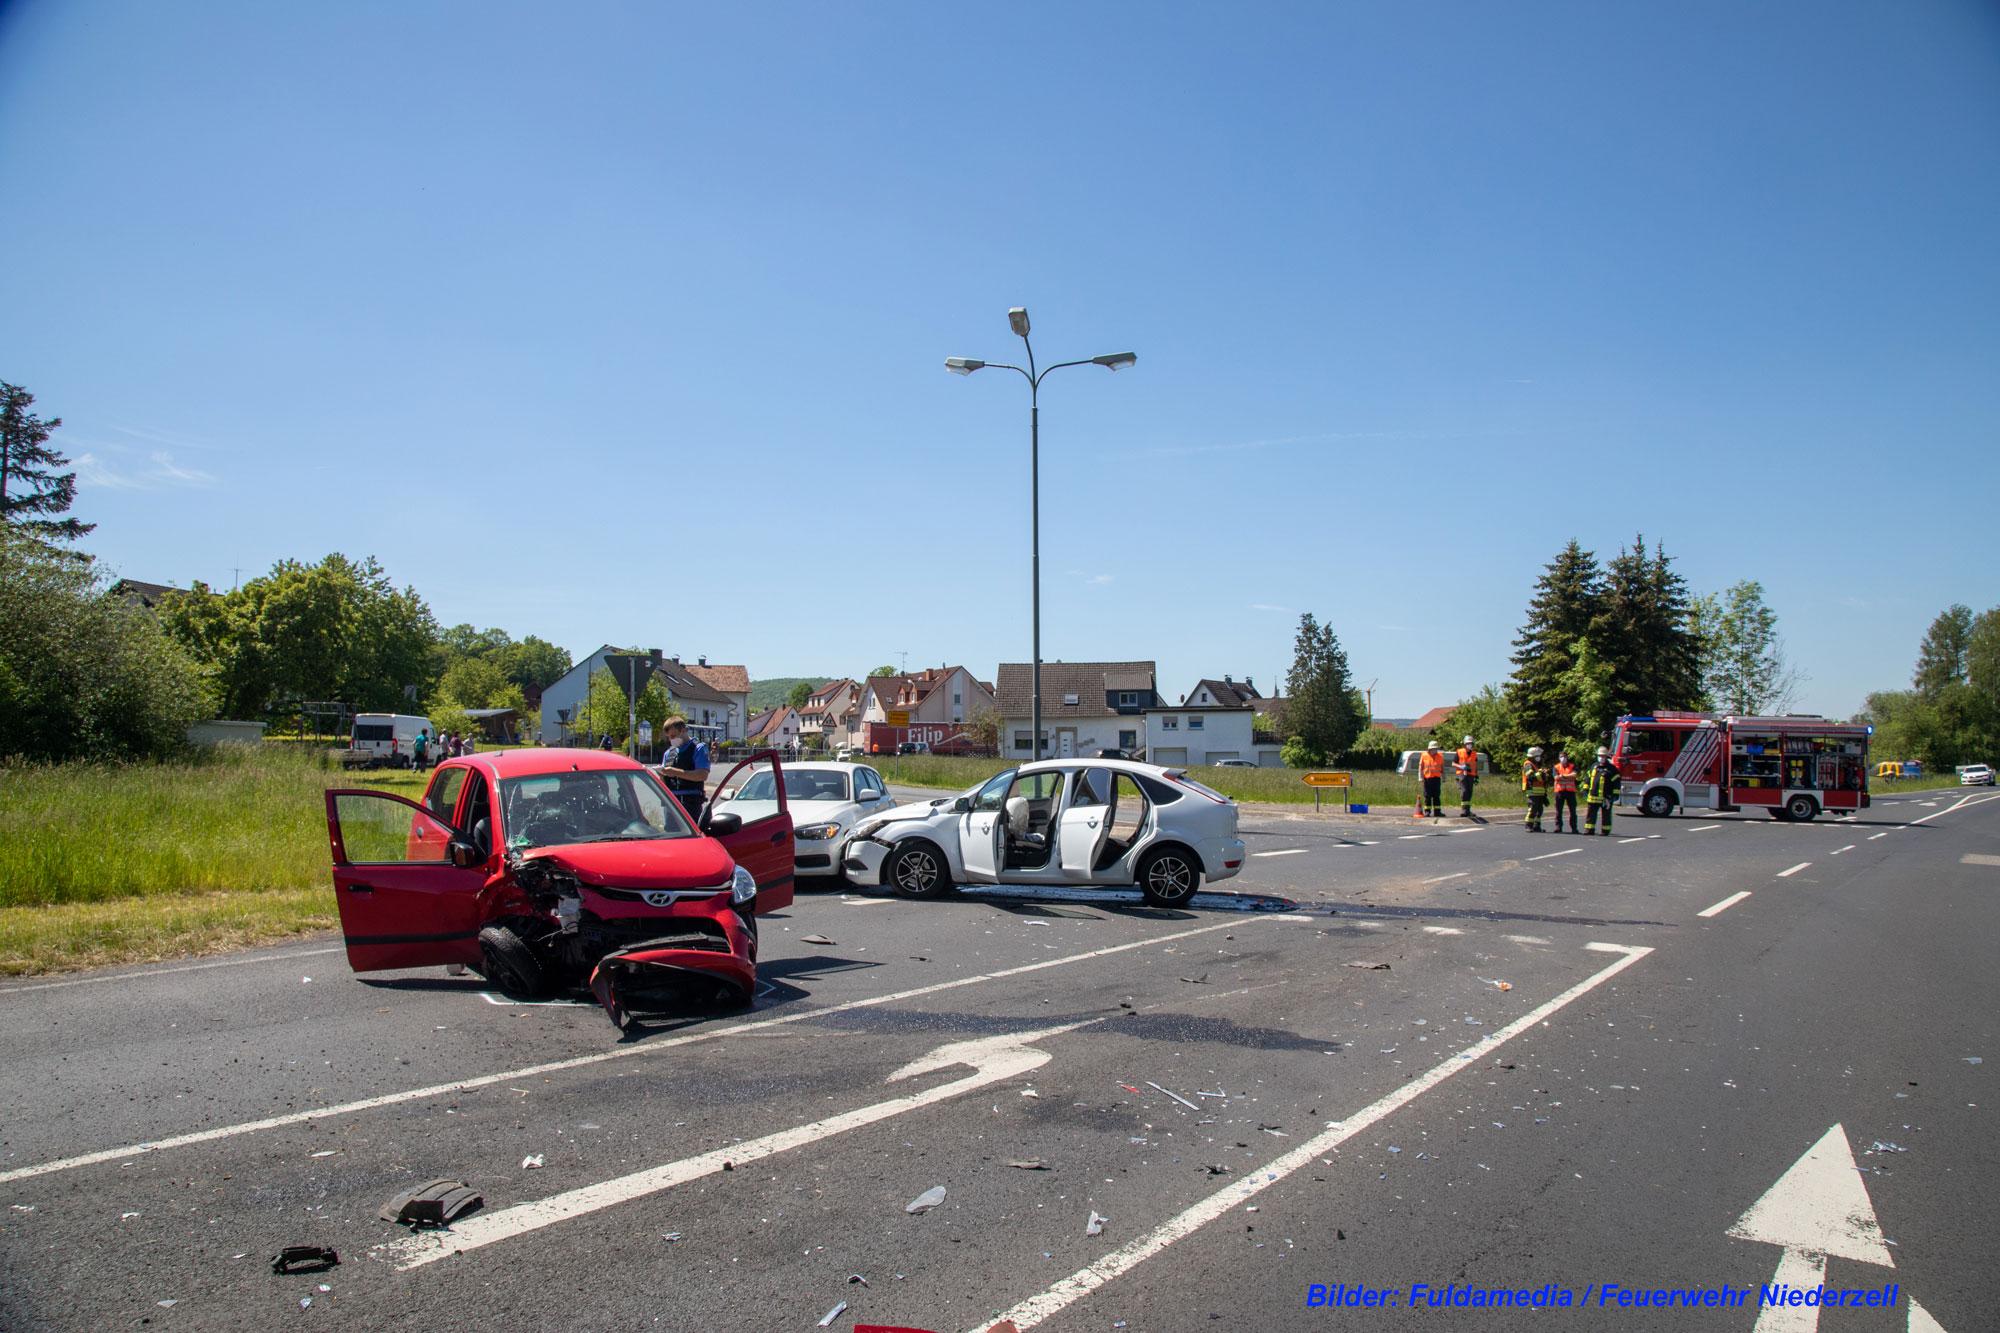 2021-42: 02.06.2021 11:33 Uhr – Verkehrsunfall